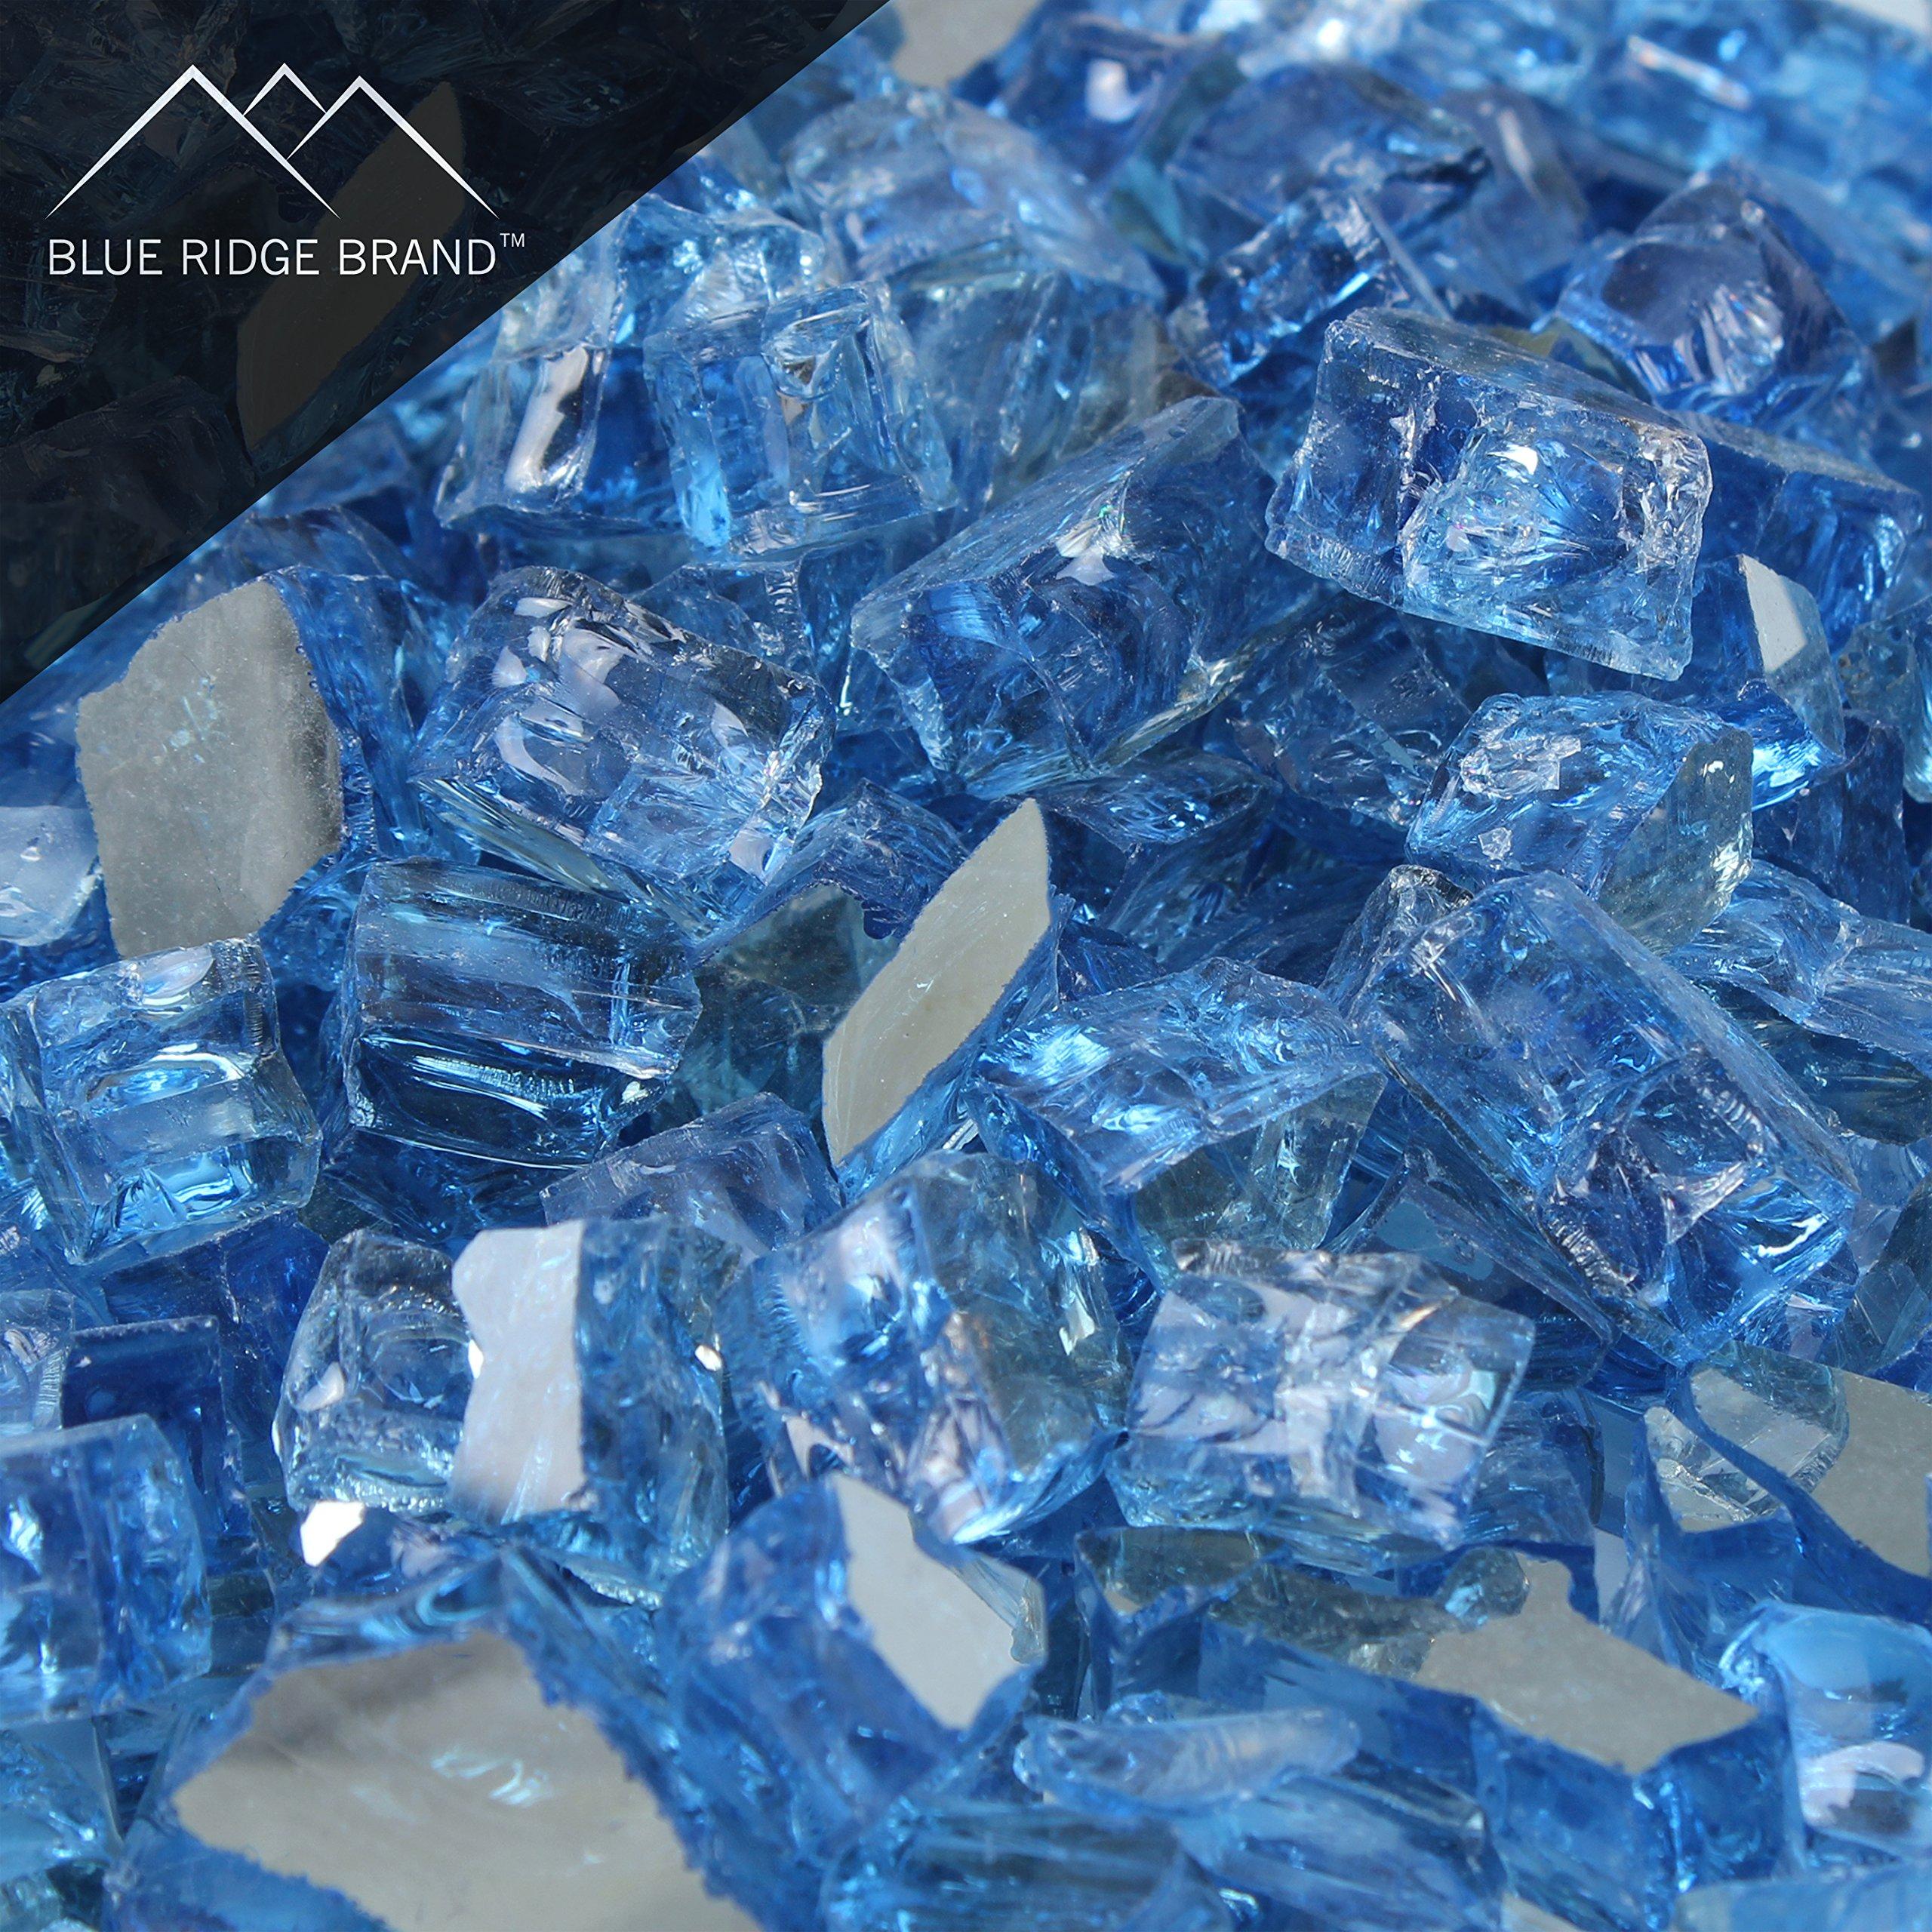 Blue Ridge Brand™ Blue Reflective Fire Glass - 50-Pound Professional Grade Fire Pit Glass - 1/2'' Reflective Fire Pit Glass Bulk Contractor Pack